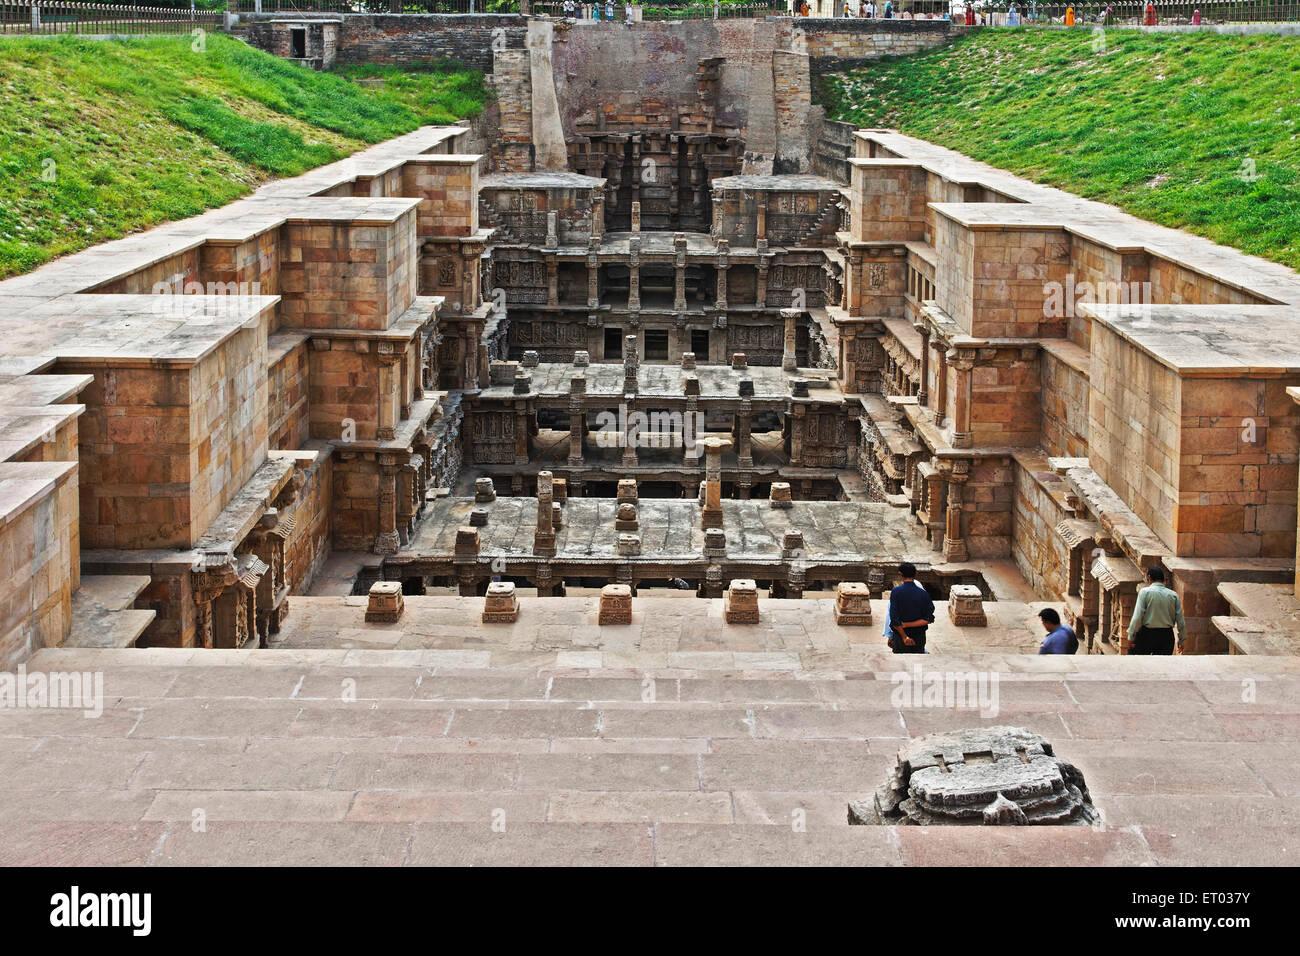 Rani ki vav ; step well ; stone carving ; Patan ; Gujarat ; India - Stock Image